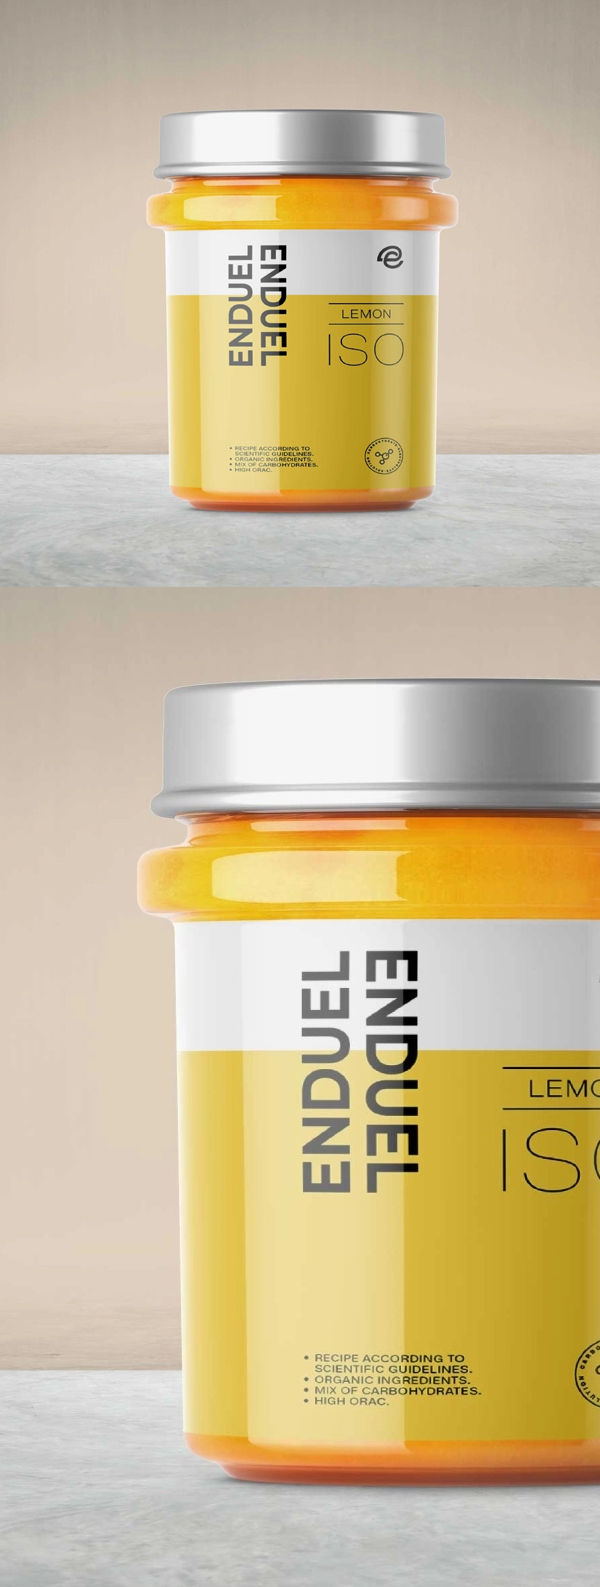 Free Lemon Cream Container Mockup